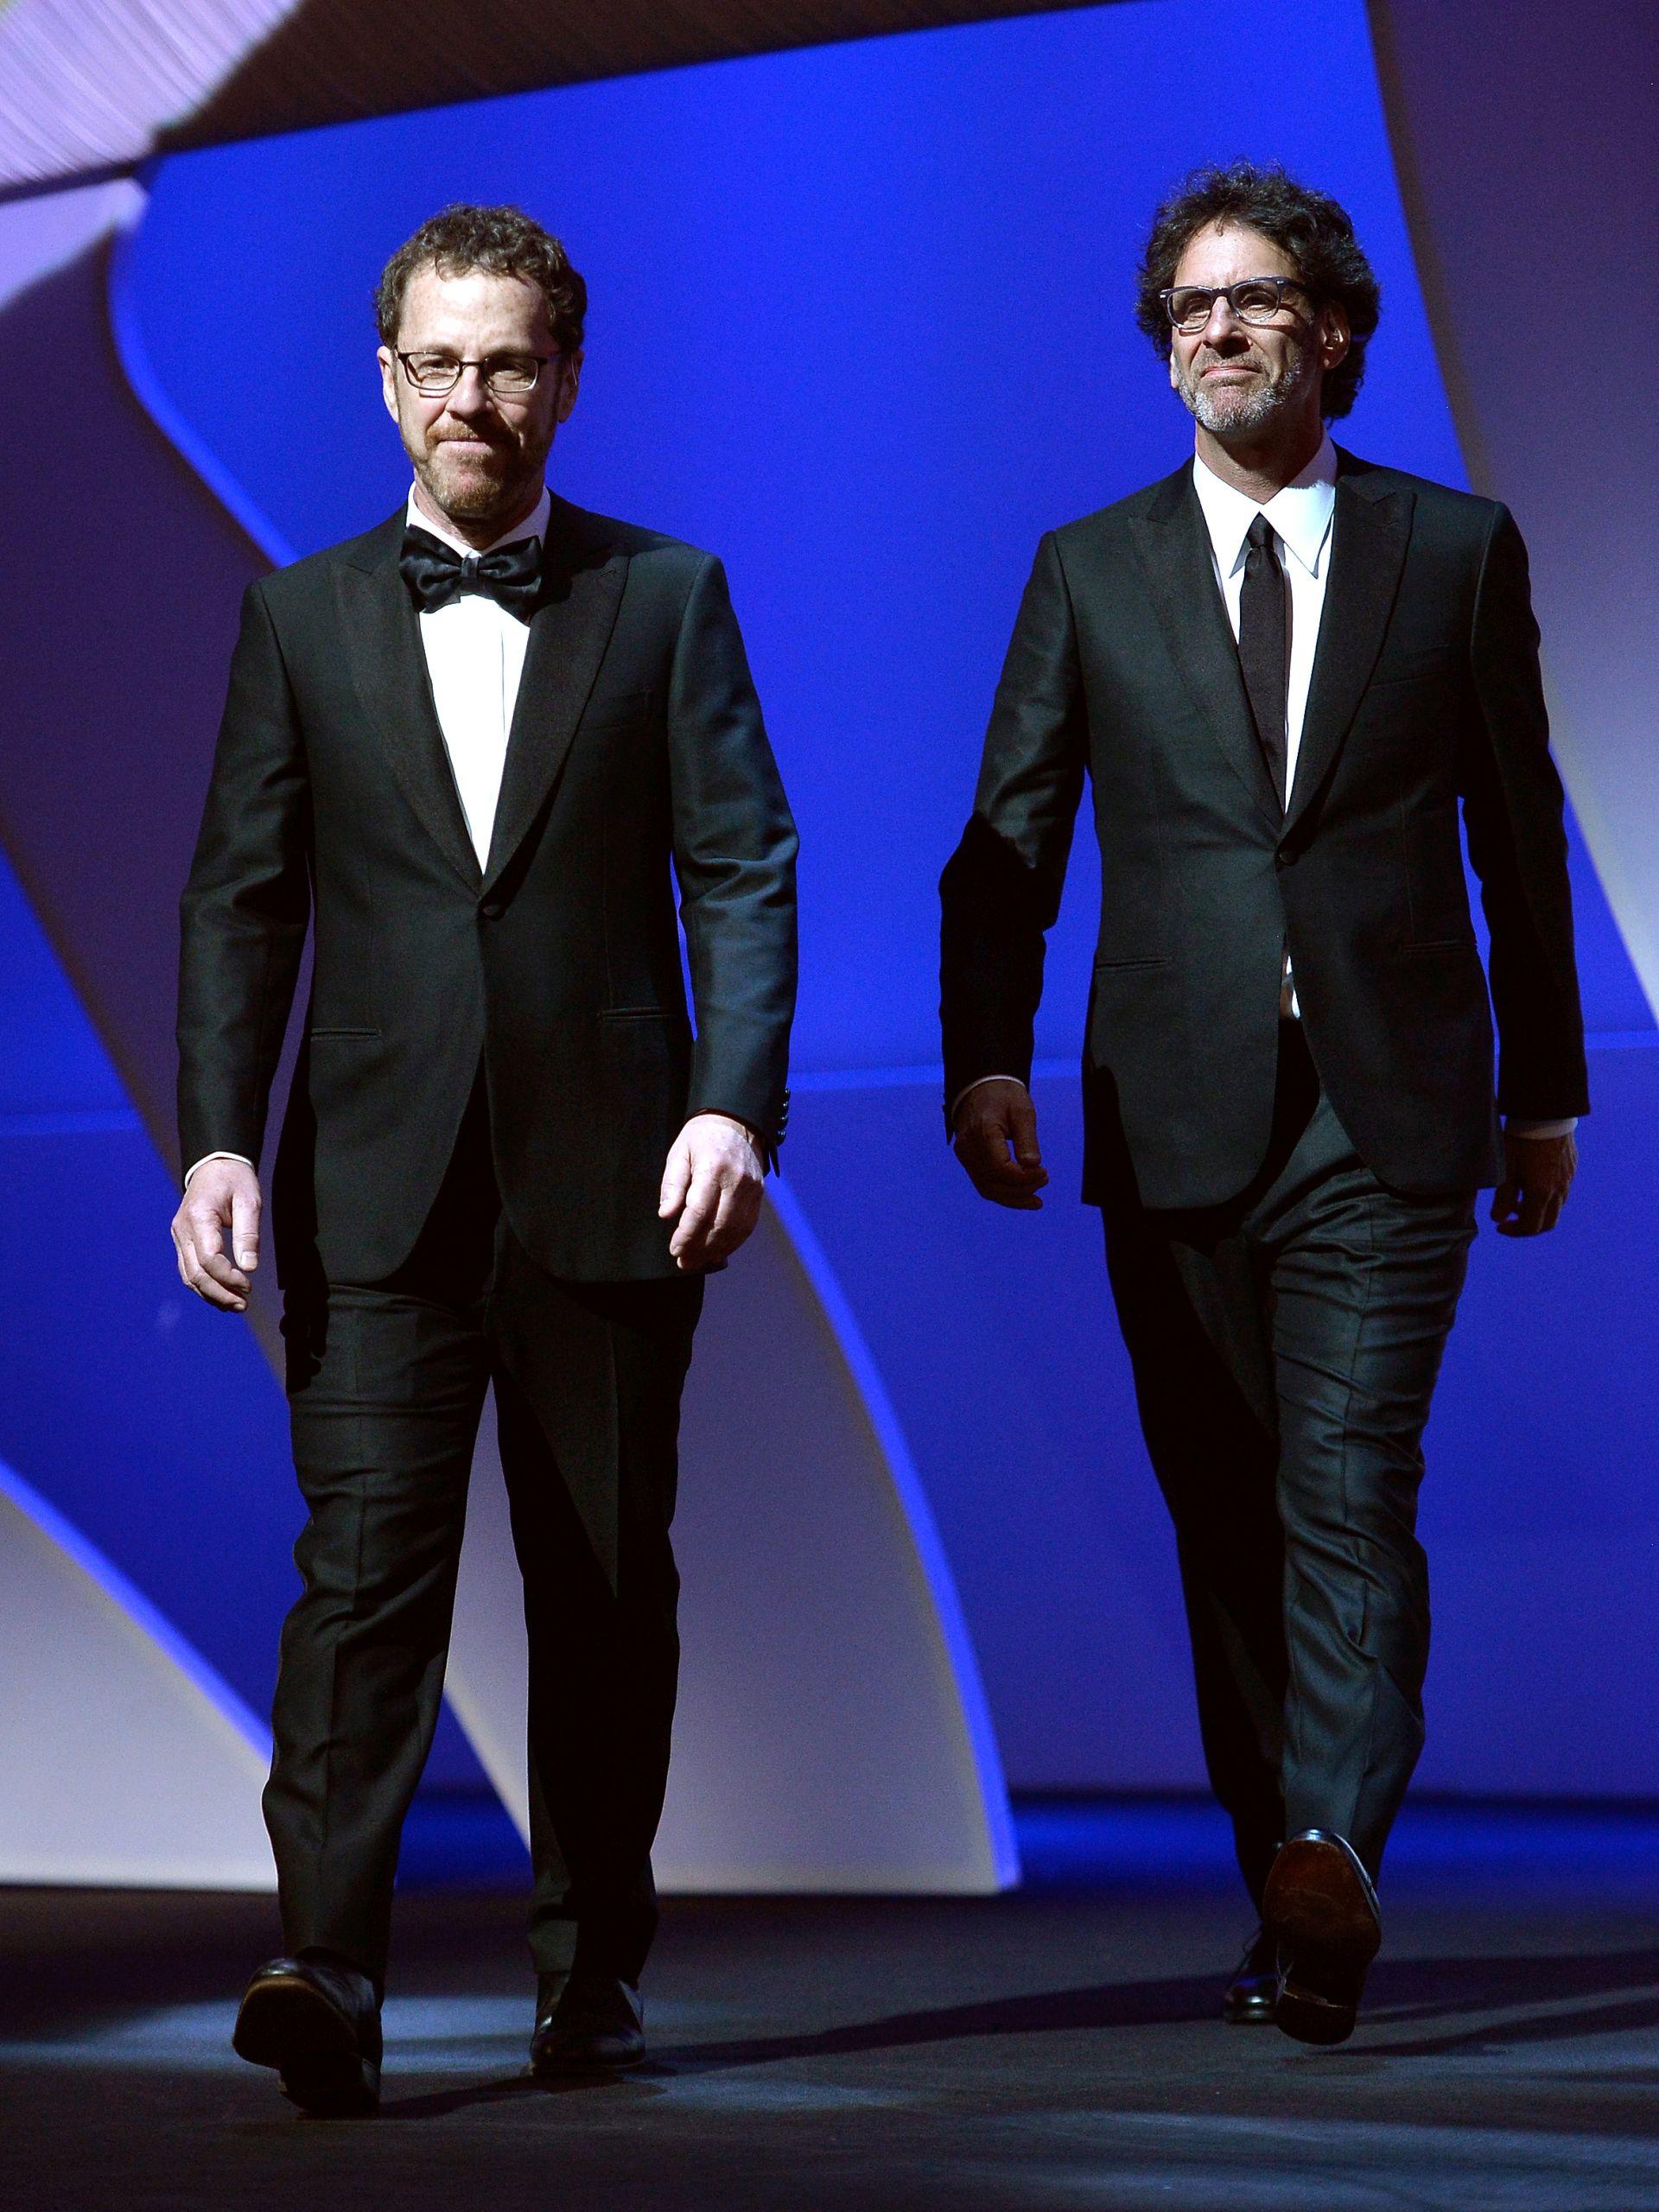 Ethann i Joel Coen, predsjednici žirija. FOTO: Pascal Le Segretain/Getty Images